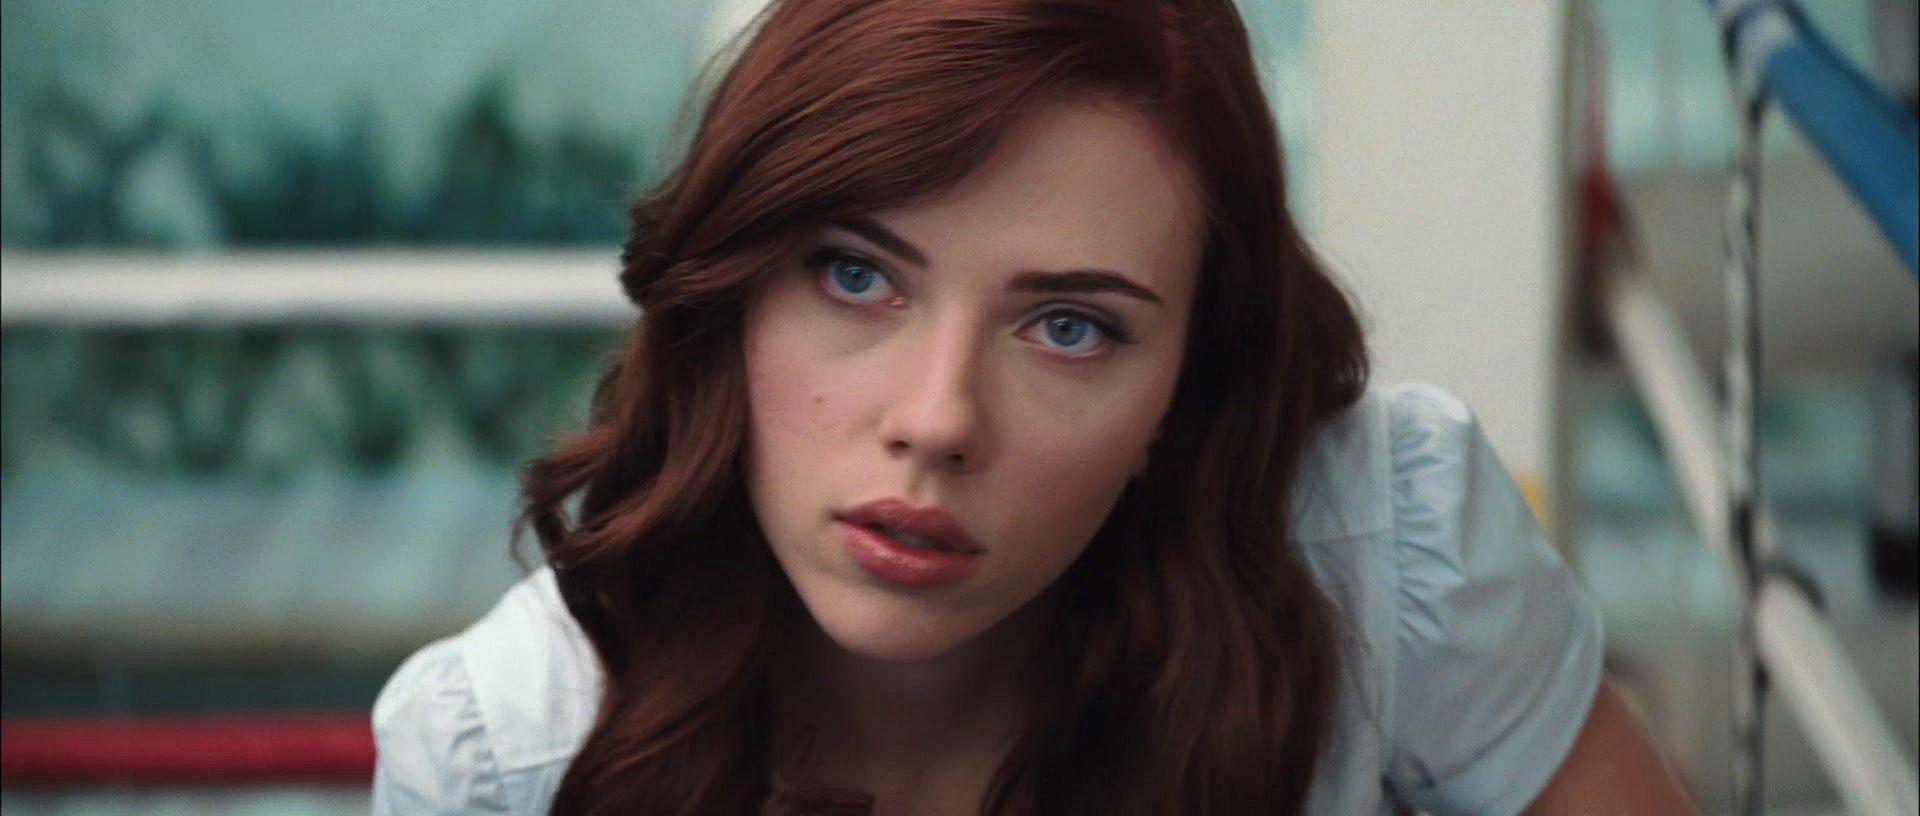 Scarlett Johansson Iron Man 2 Trailer Screencaps Scarlett